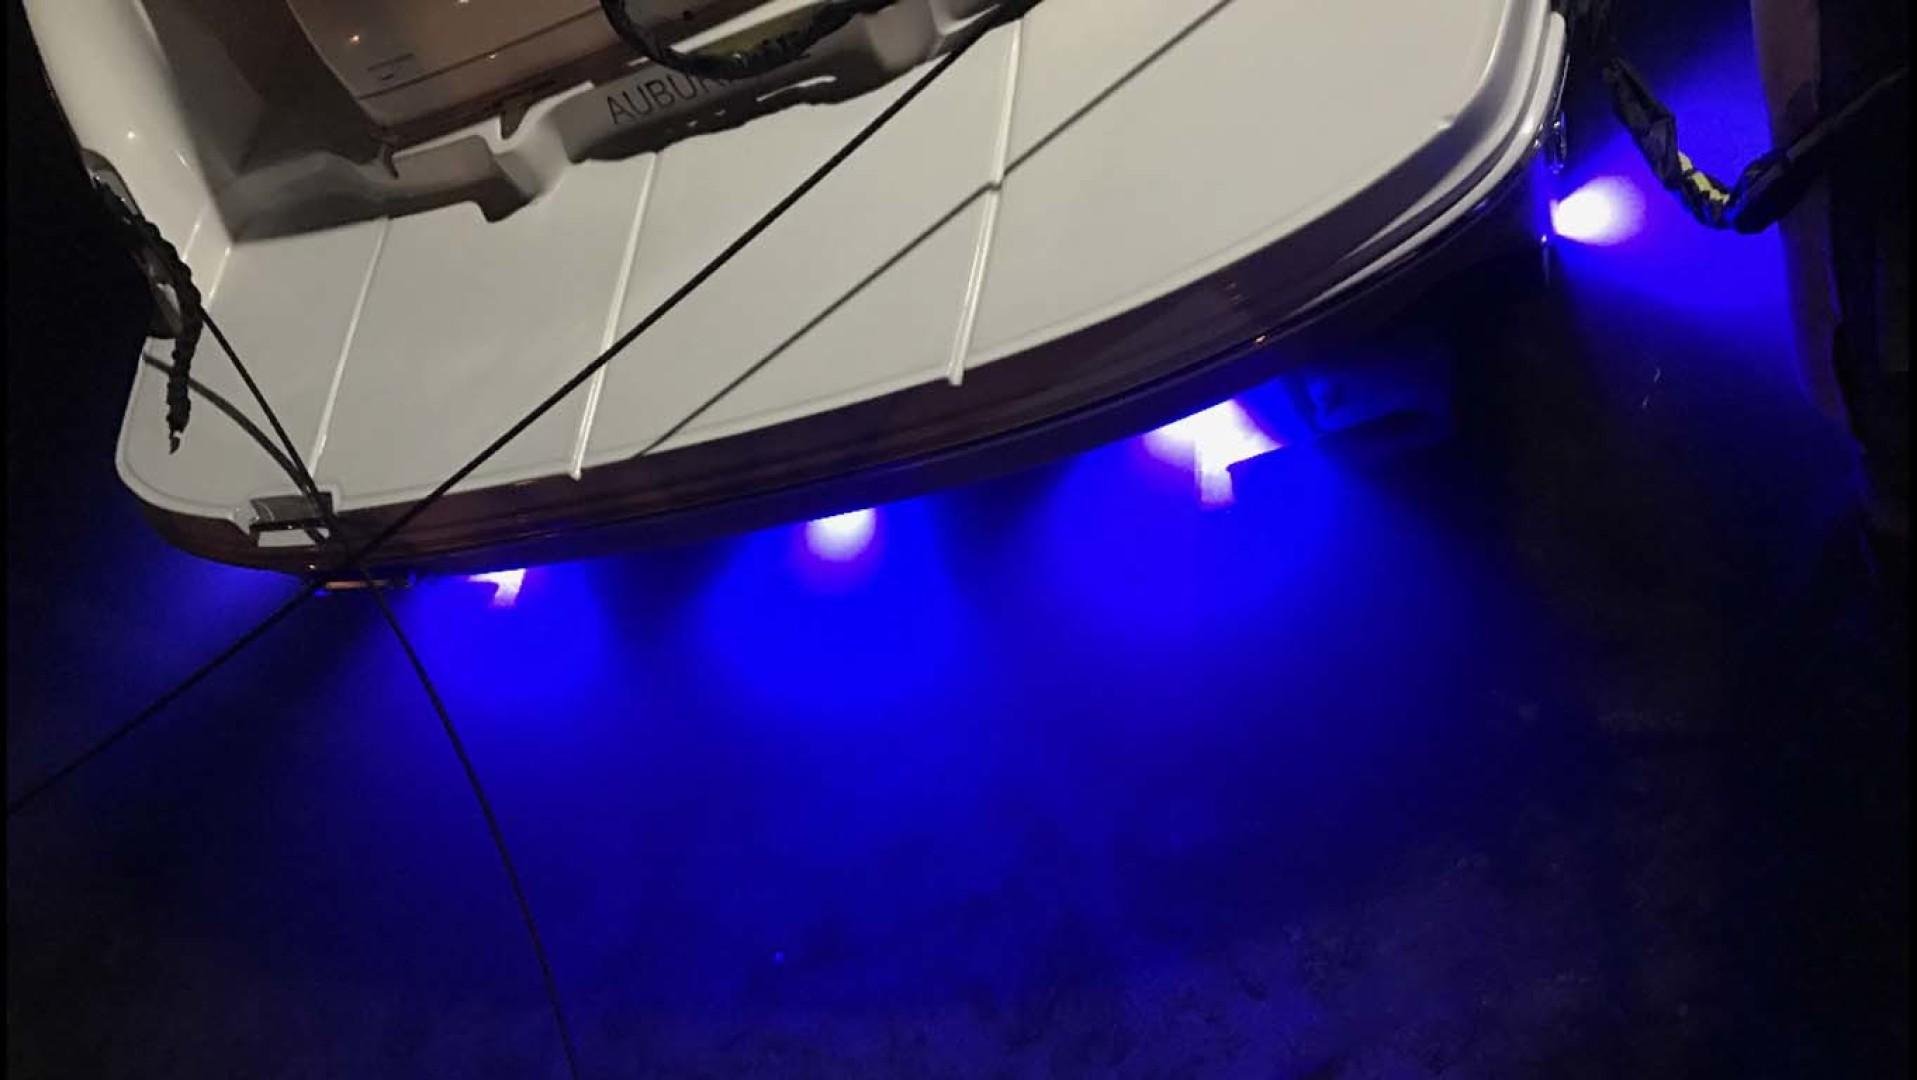 Sea Ray-Sundancer 2006-Late Fee Destin-Florida-United States-Underwater Lights-1125981 | Thumbnail